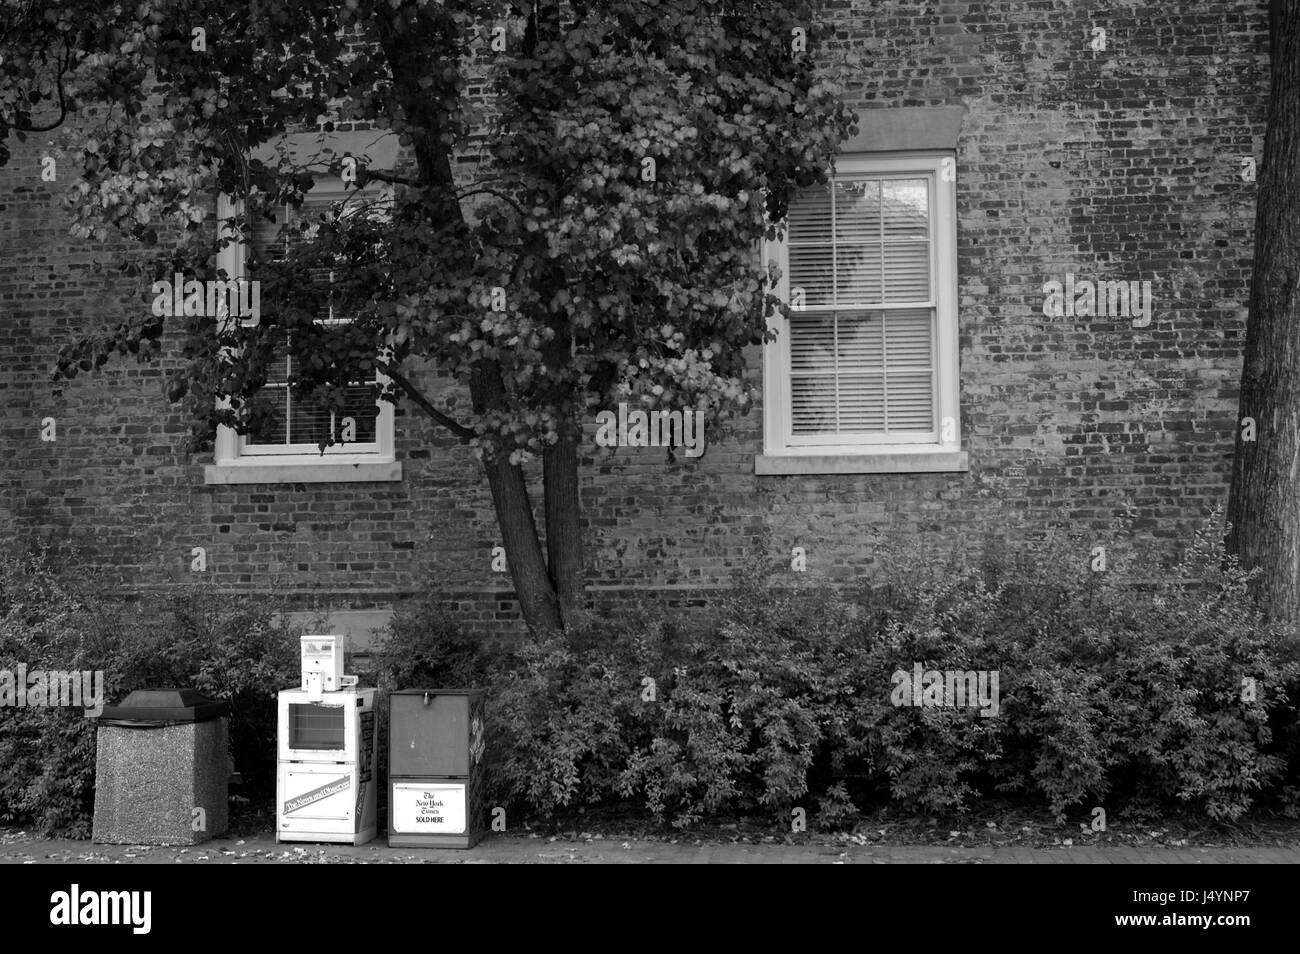 Newspaper Stands, University of North Carolina at Chapel Hill - Stock Image